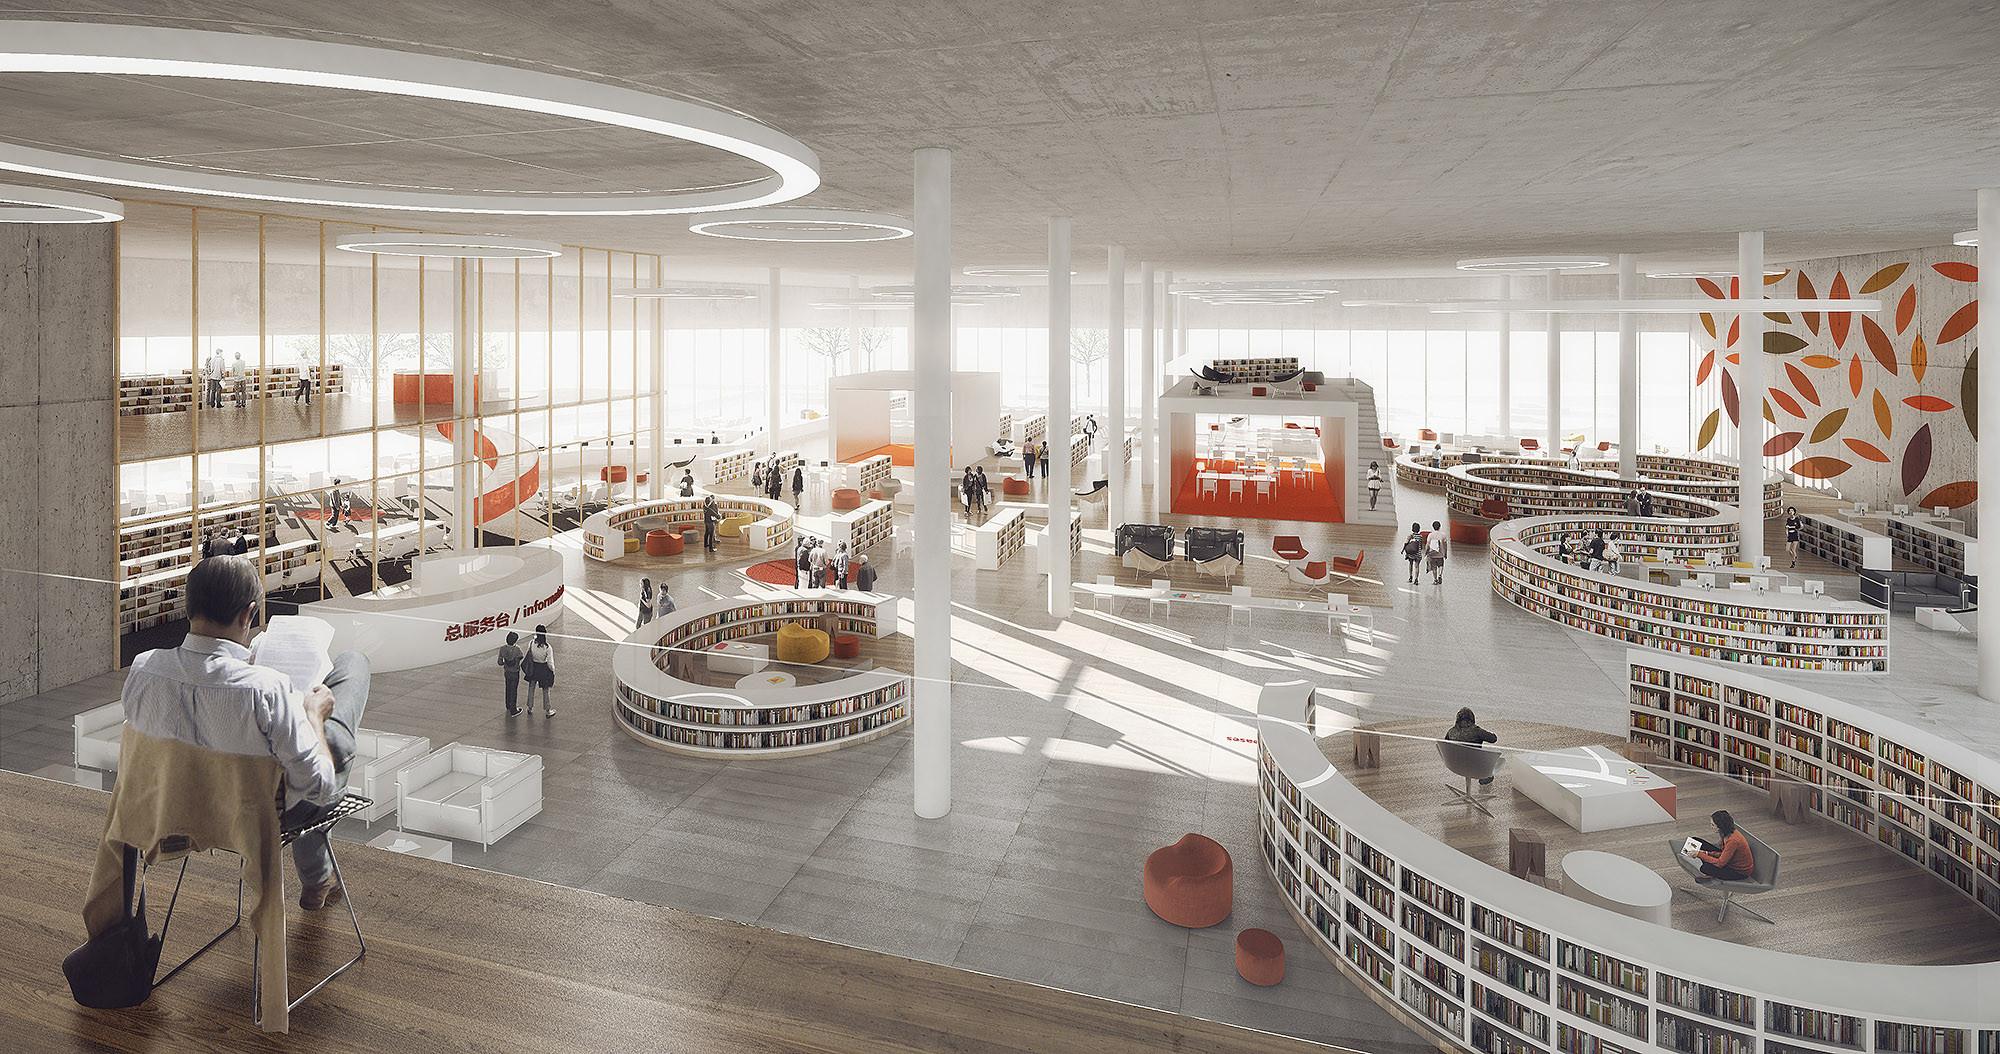 Schmidt hammer lassen wins competition to design ningbo 39 s - Architecture moderne residentielle schmidt lepper ...